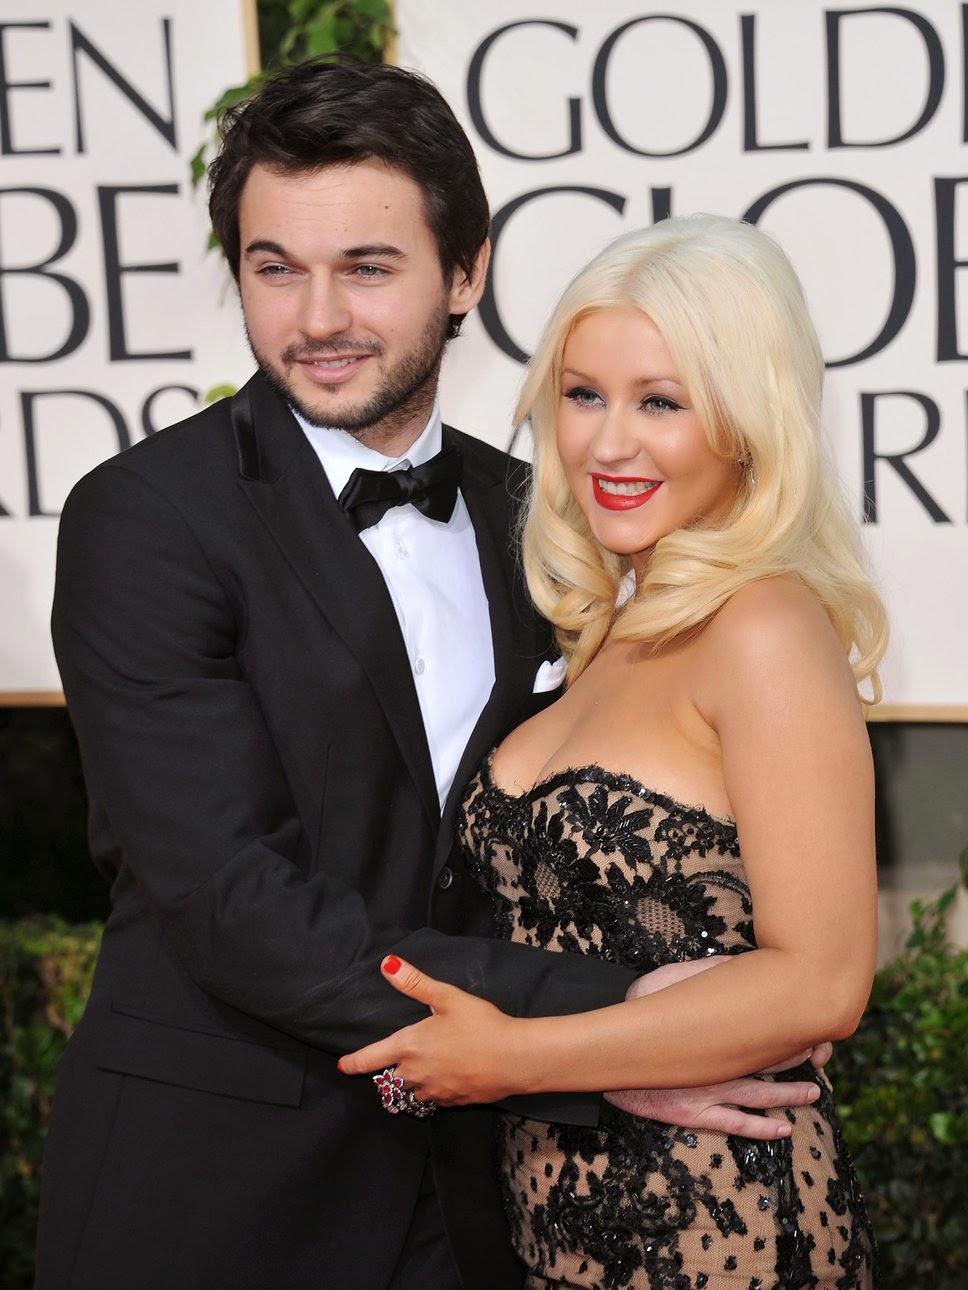 Christina Aguilera's Engagement Ring